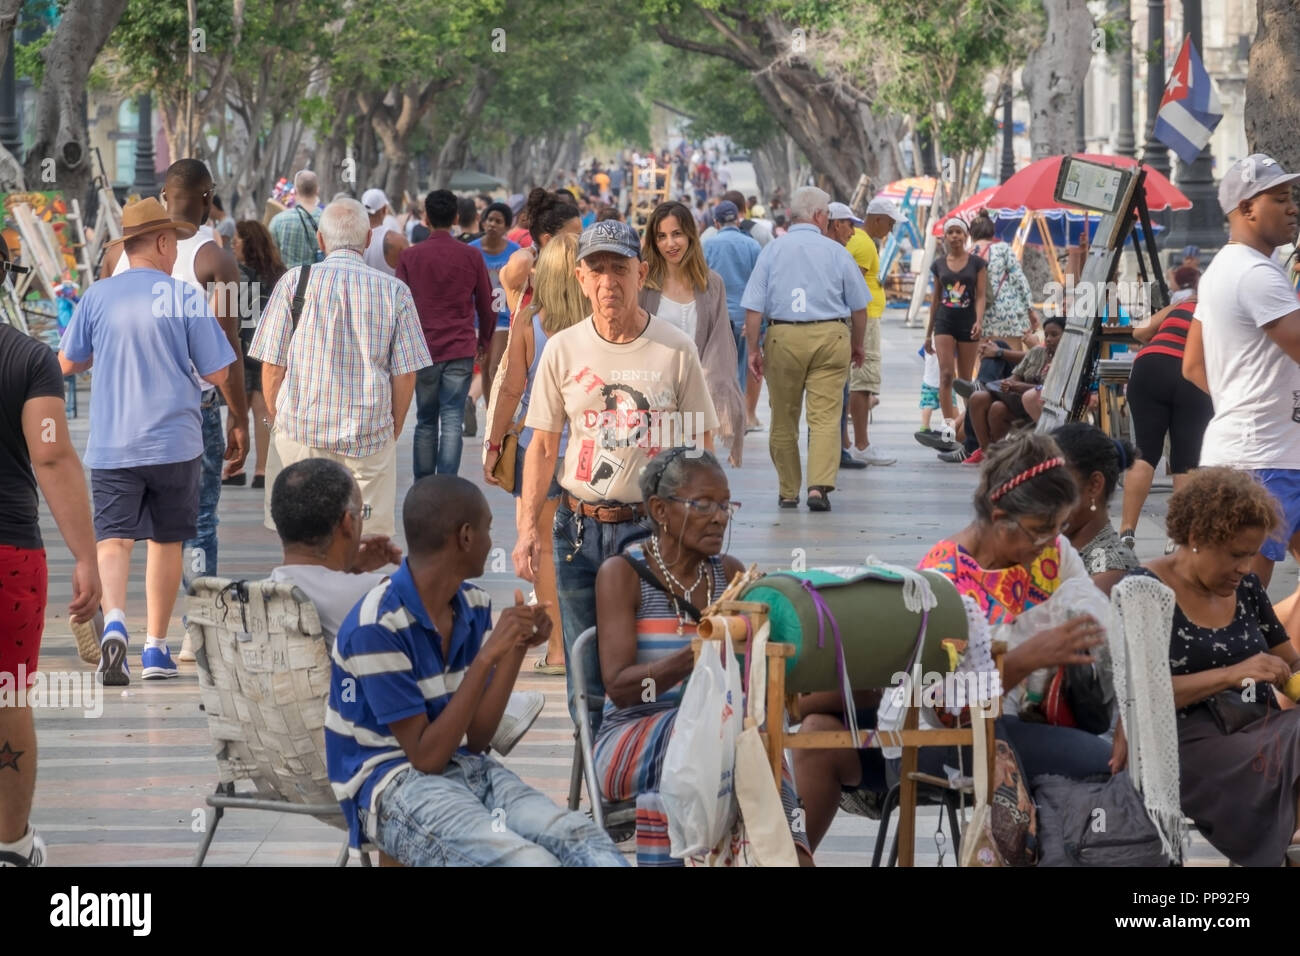 CUB, Kuba, Havanna, 18.03.2018, Havanna Künstlermarkt auf der  Paseo del Prado  Paseo de Martí  [2018 Christoph Hermann] Stock Photo